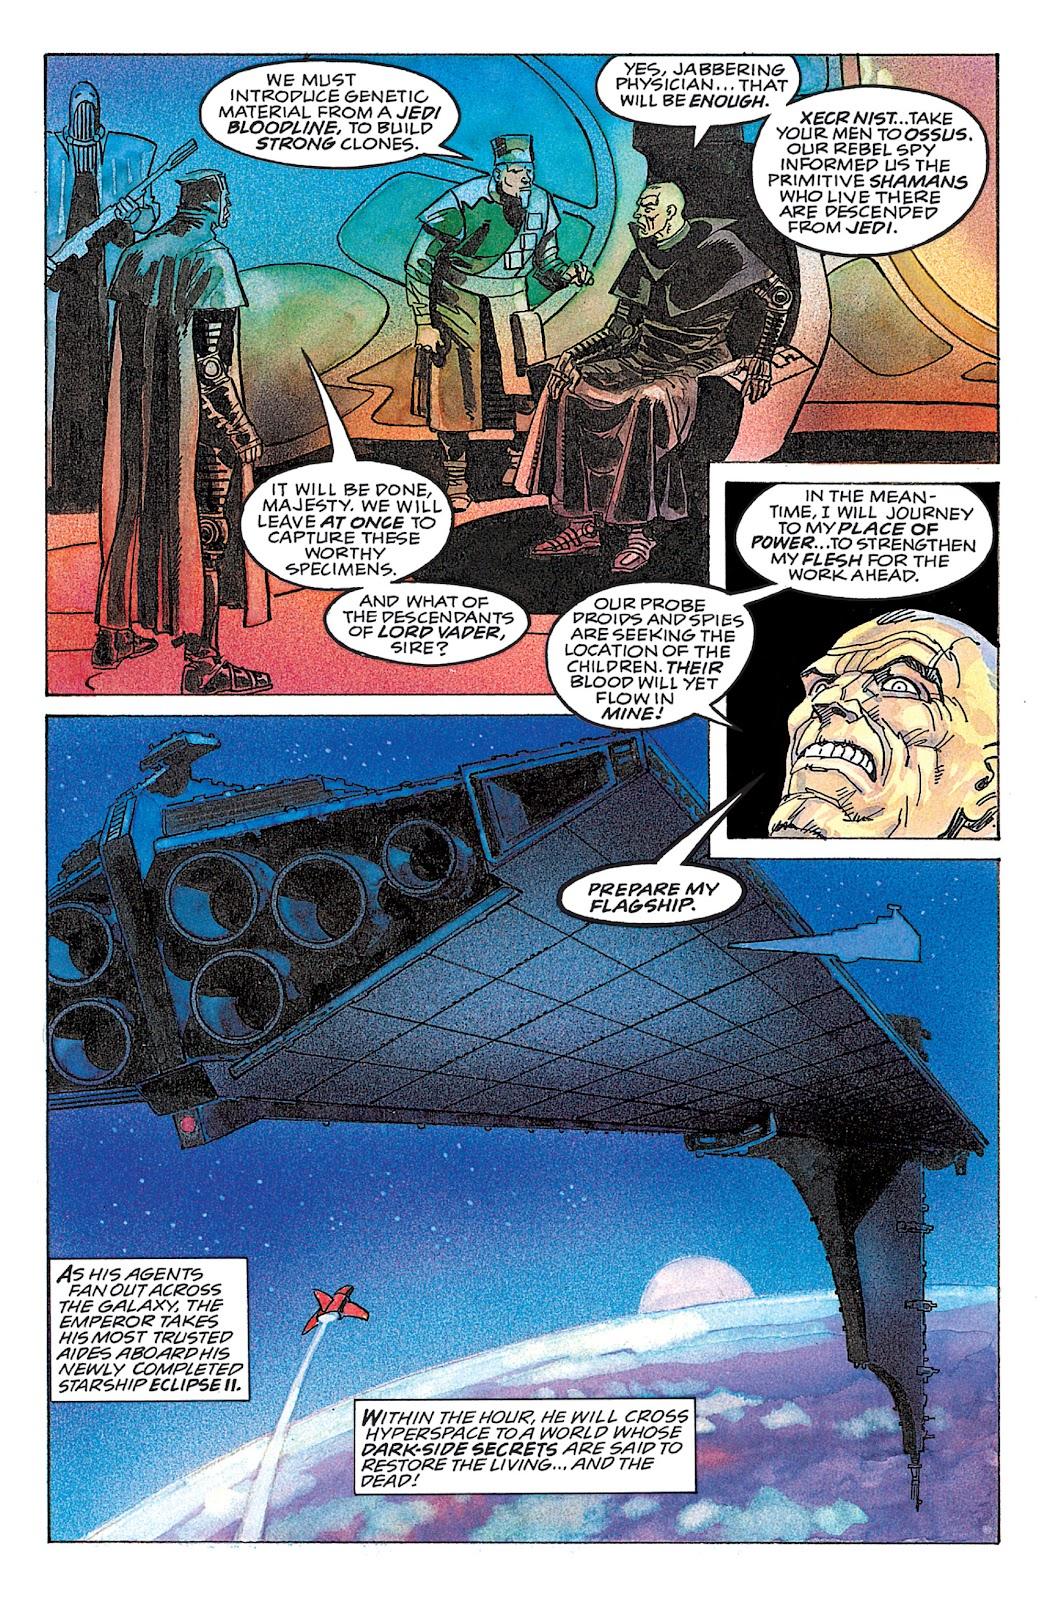 Read online Star Wars: Dark Empire Trilogy comic -  Issue # TPB (Part 4) - 24